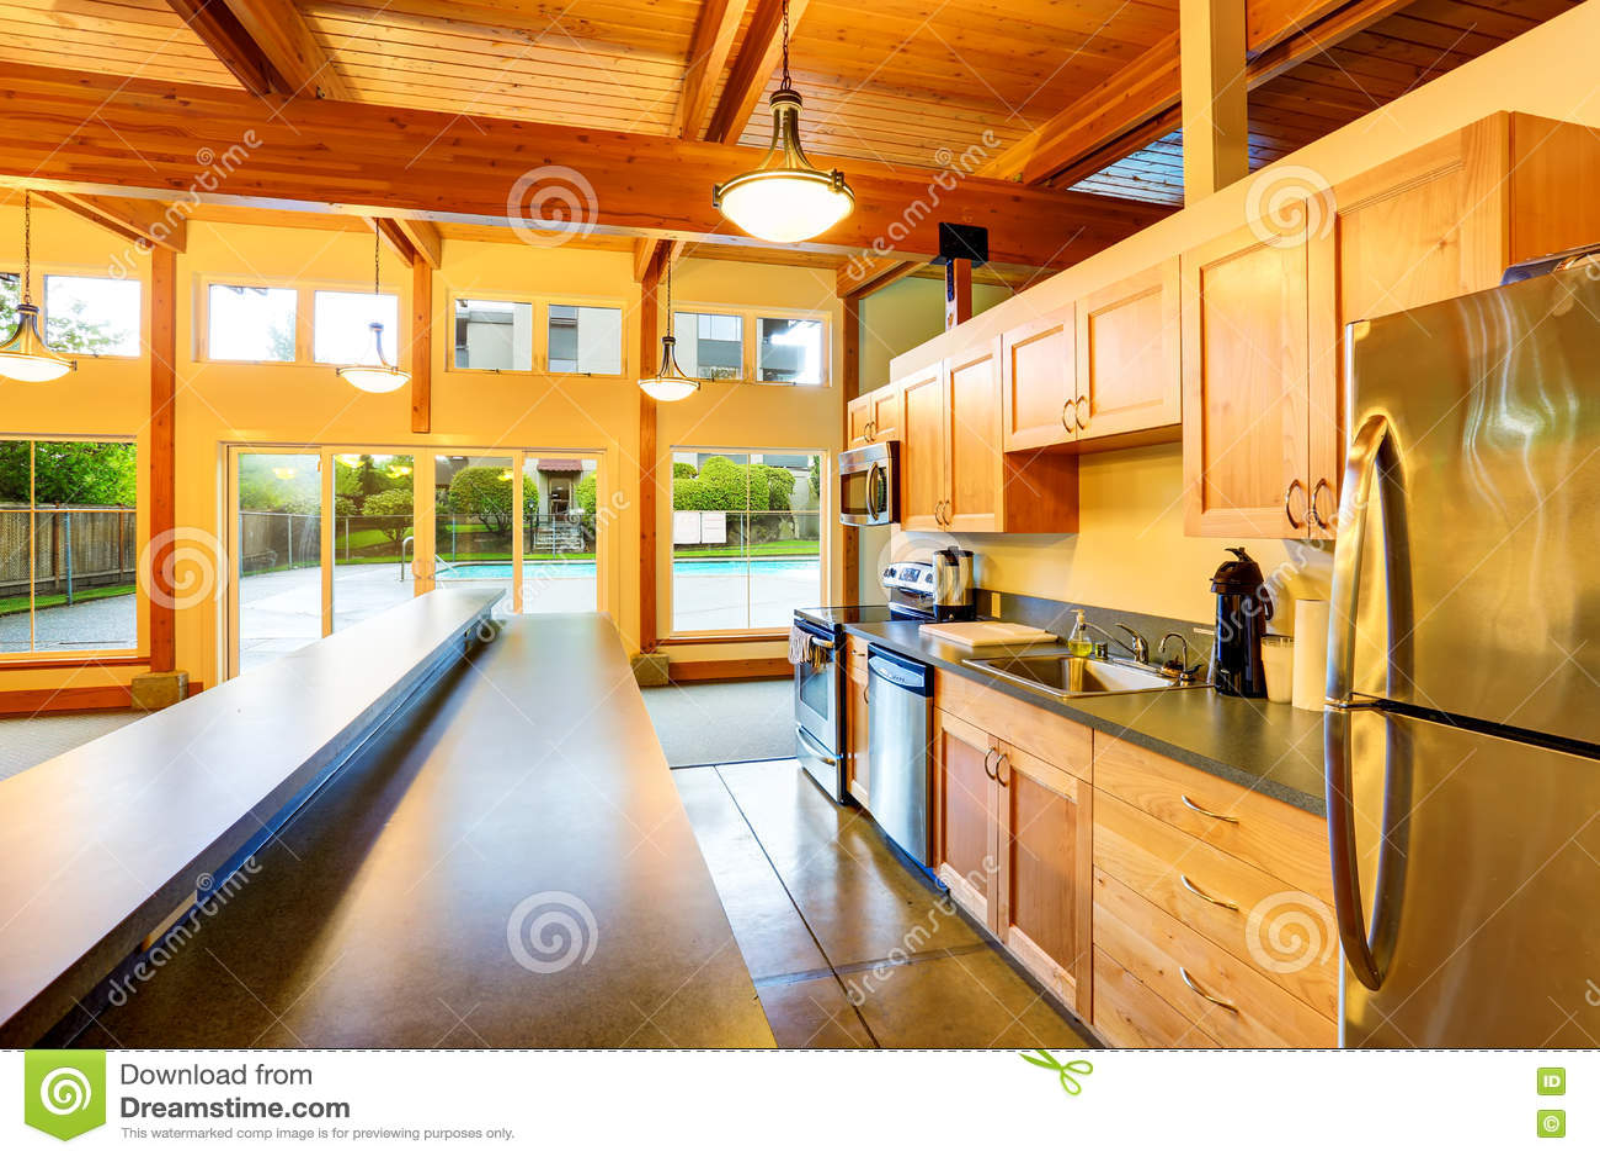 backyard kitchen designs faucets delta 空心肋板计划厨房室退出对后院游泳池库存图片 图片包括有现代 凳子 空心肋板计划厨房室退出对后院游泳池